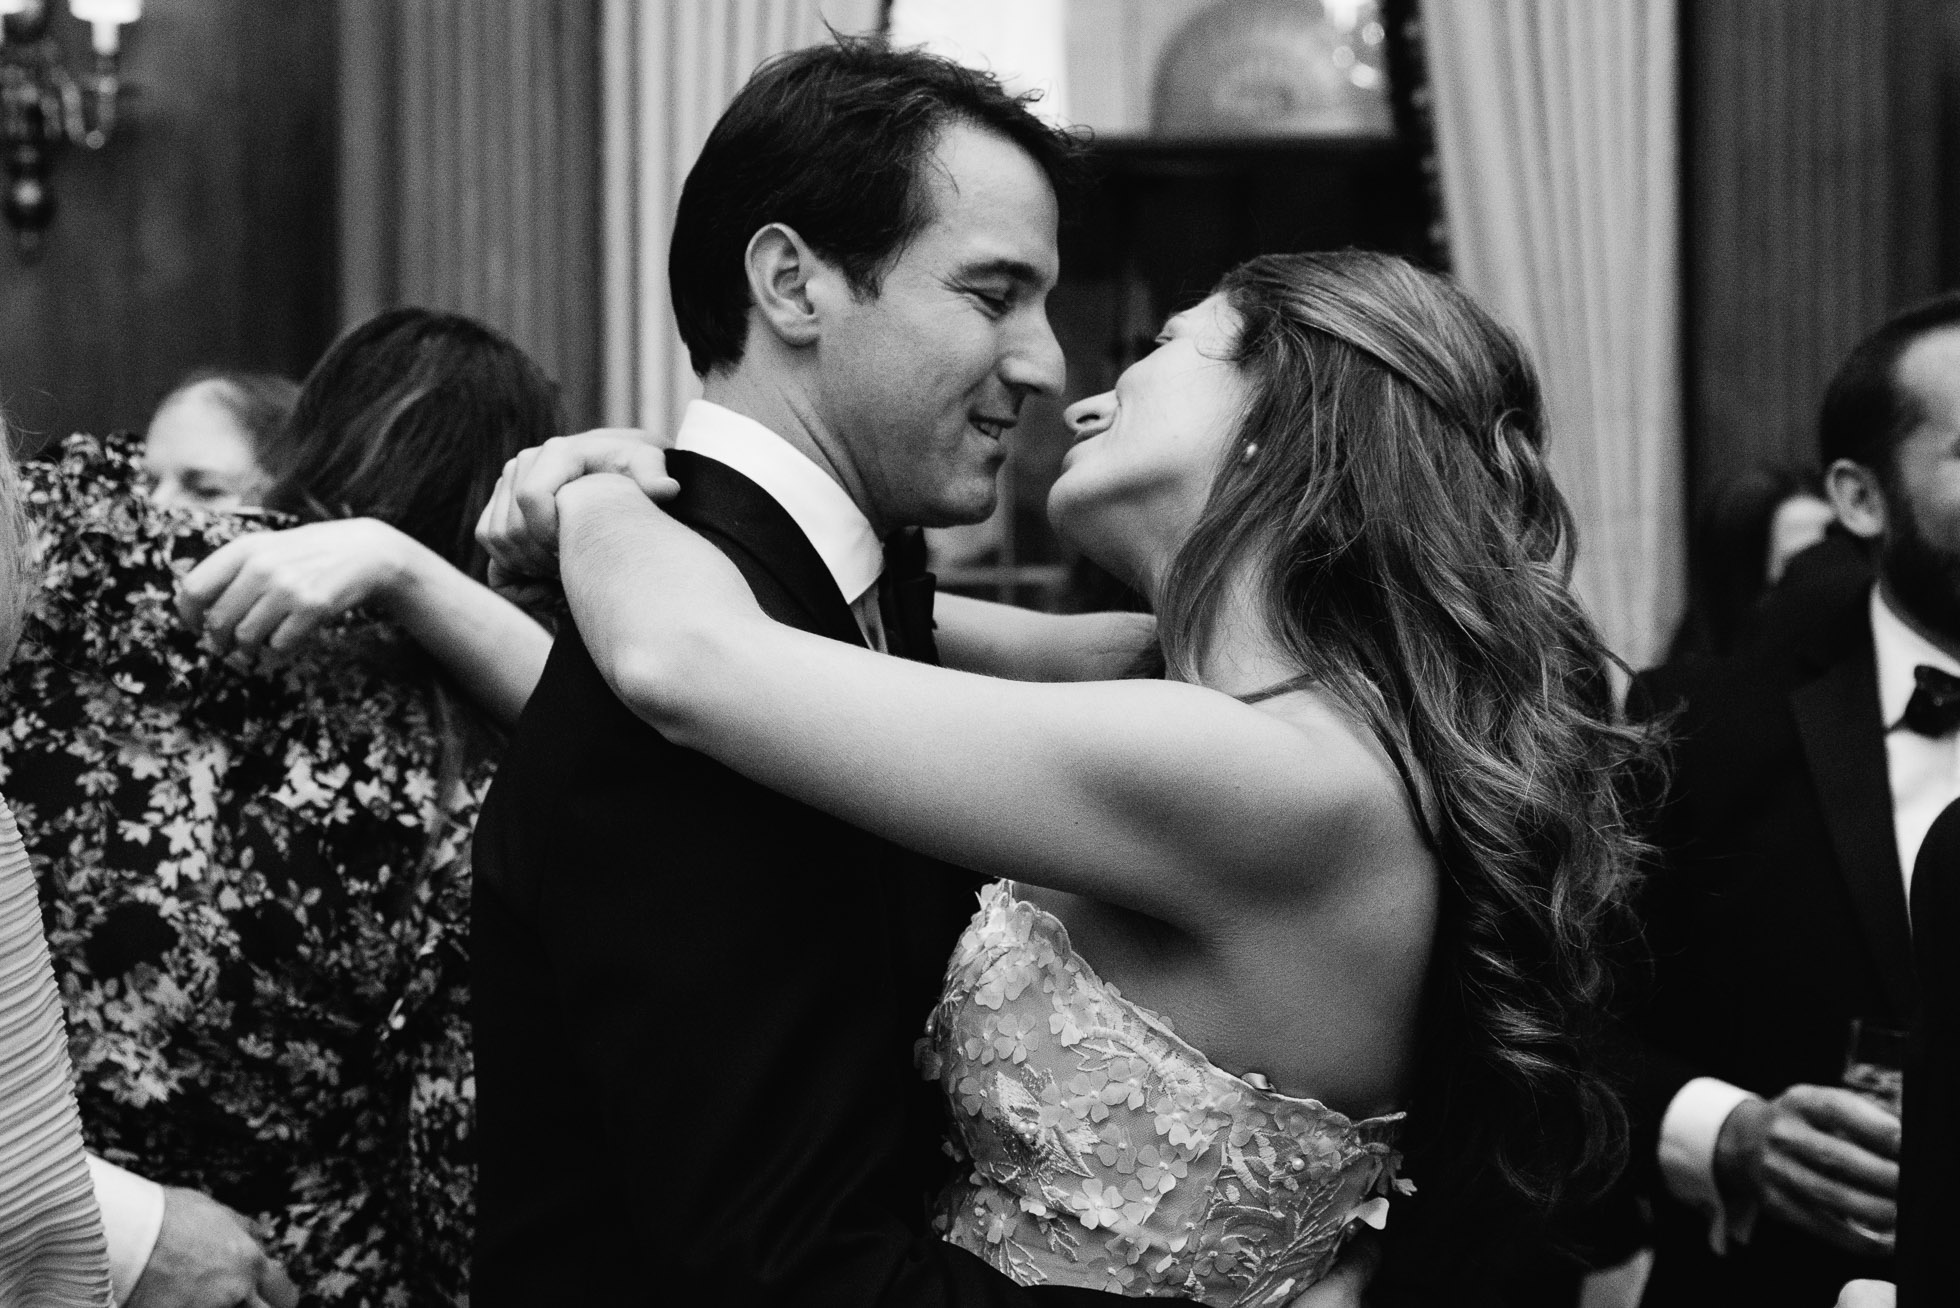 Duquesne Club Pittsburgh PA, Mariah Fisher, reception dancing, party-1.jpg